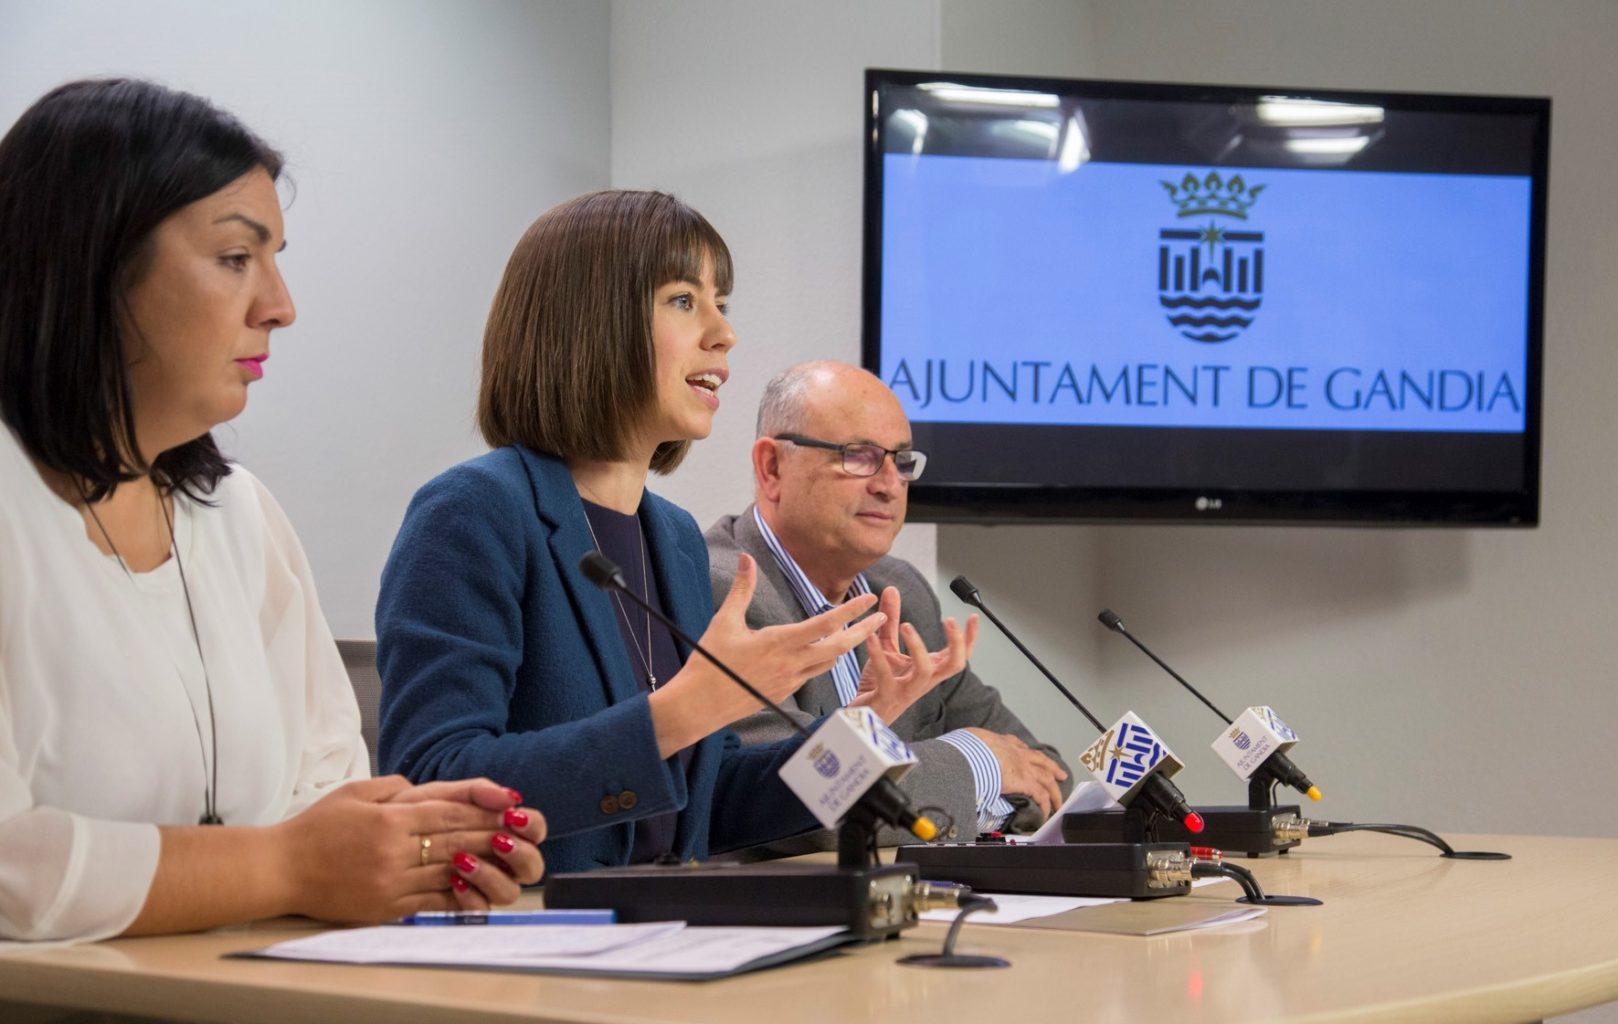 Diana Morant El govern de Gandia anuncia una baixada d'impostos